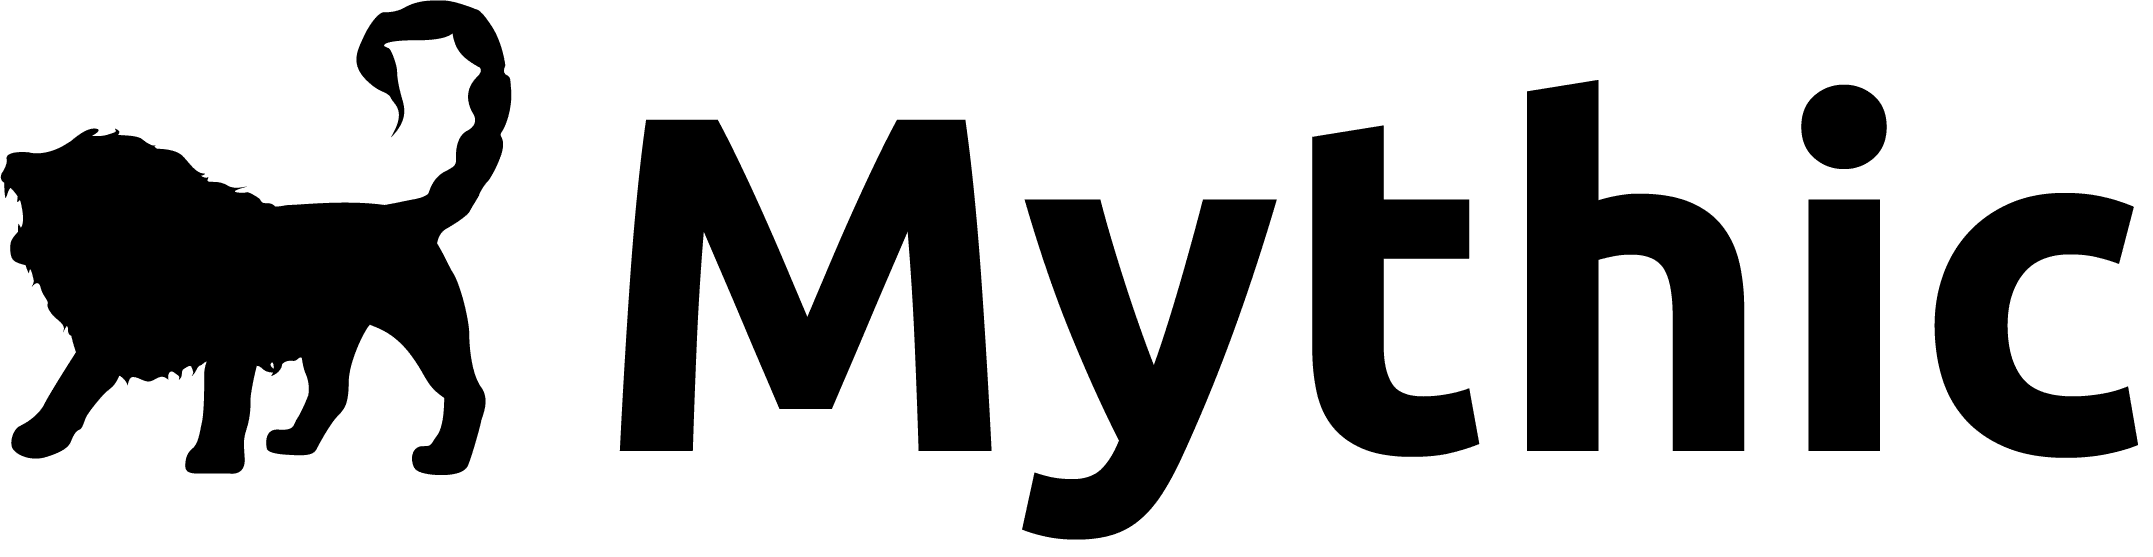 Mythic Design Company